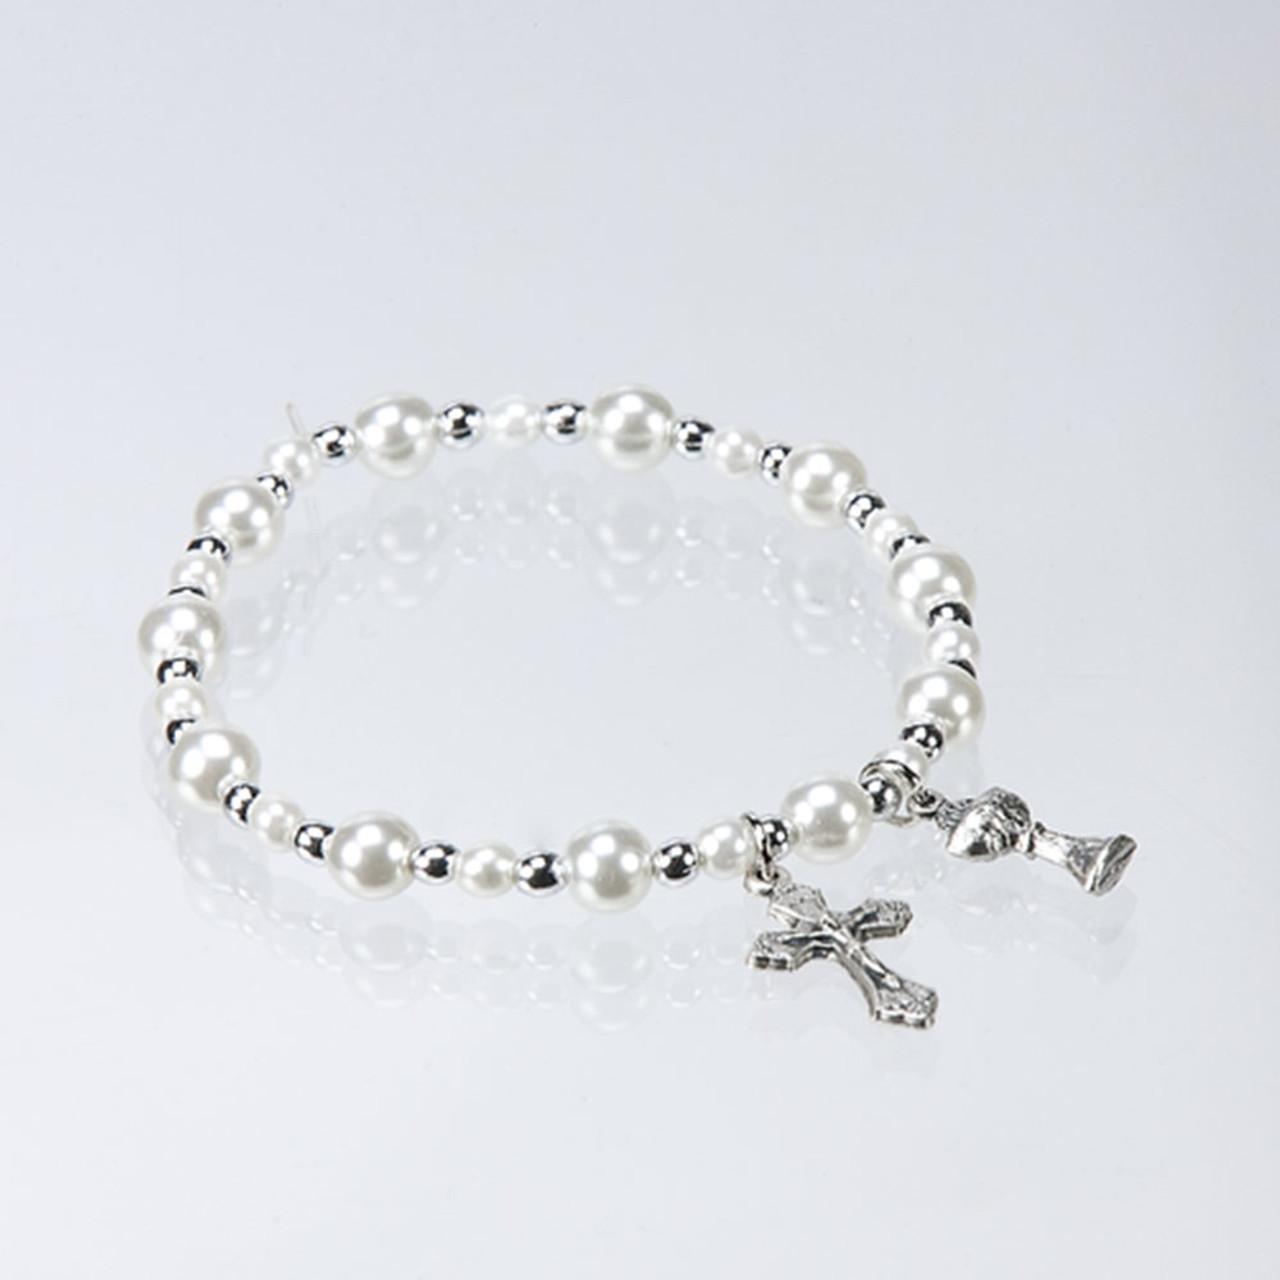 Pearl/Silver Communion Stretch Bracelet